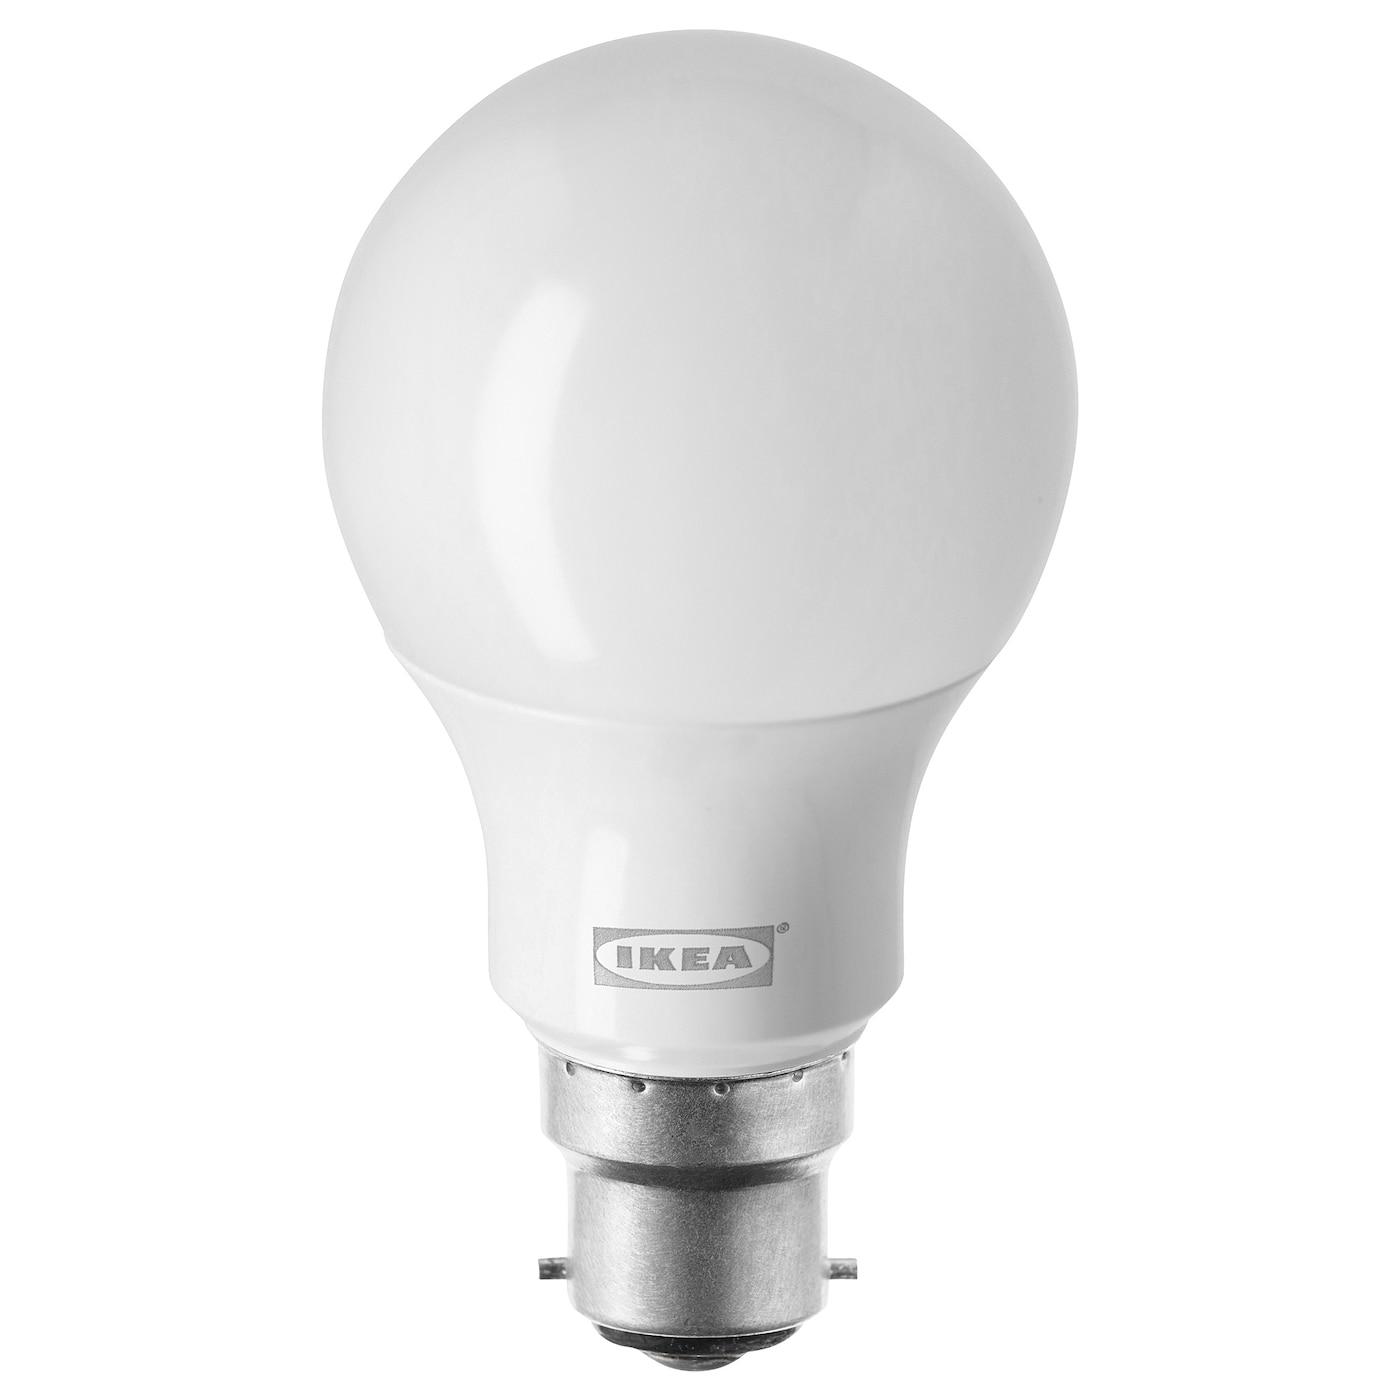 RYET LED bulb B22 470 lumen, globe opal white